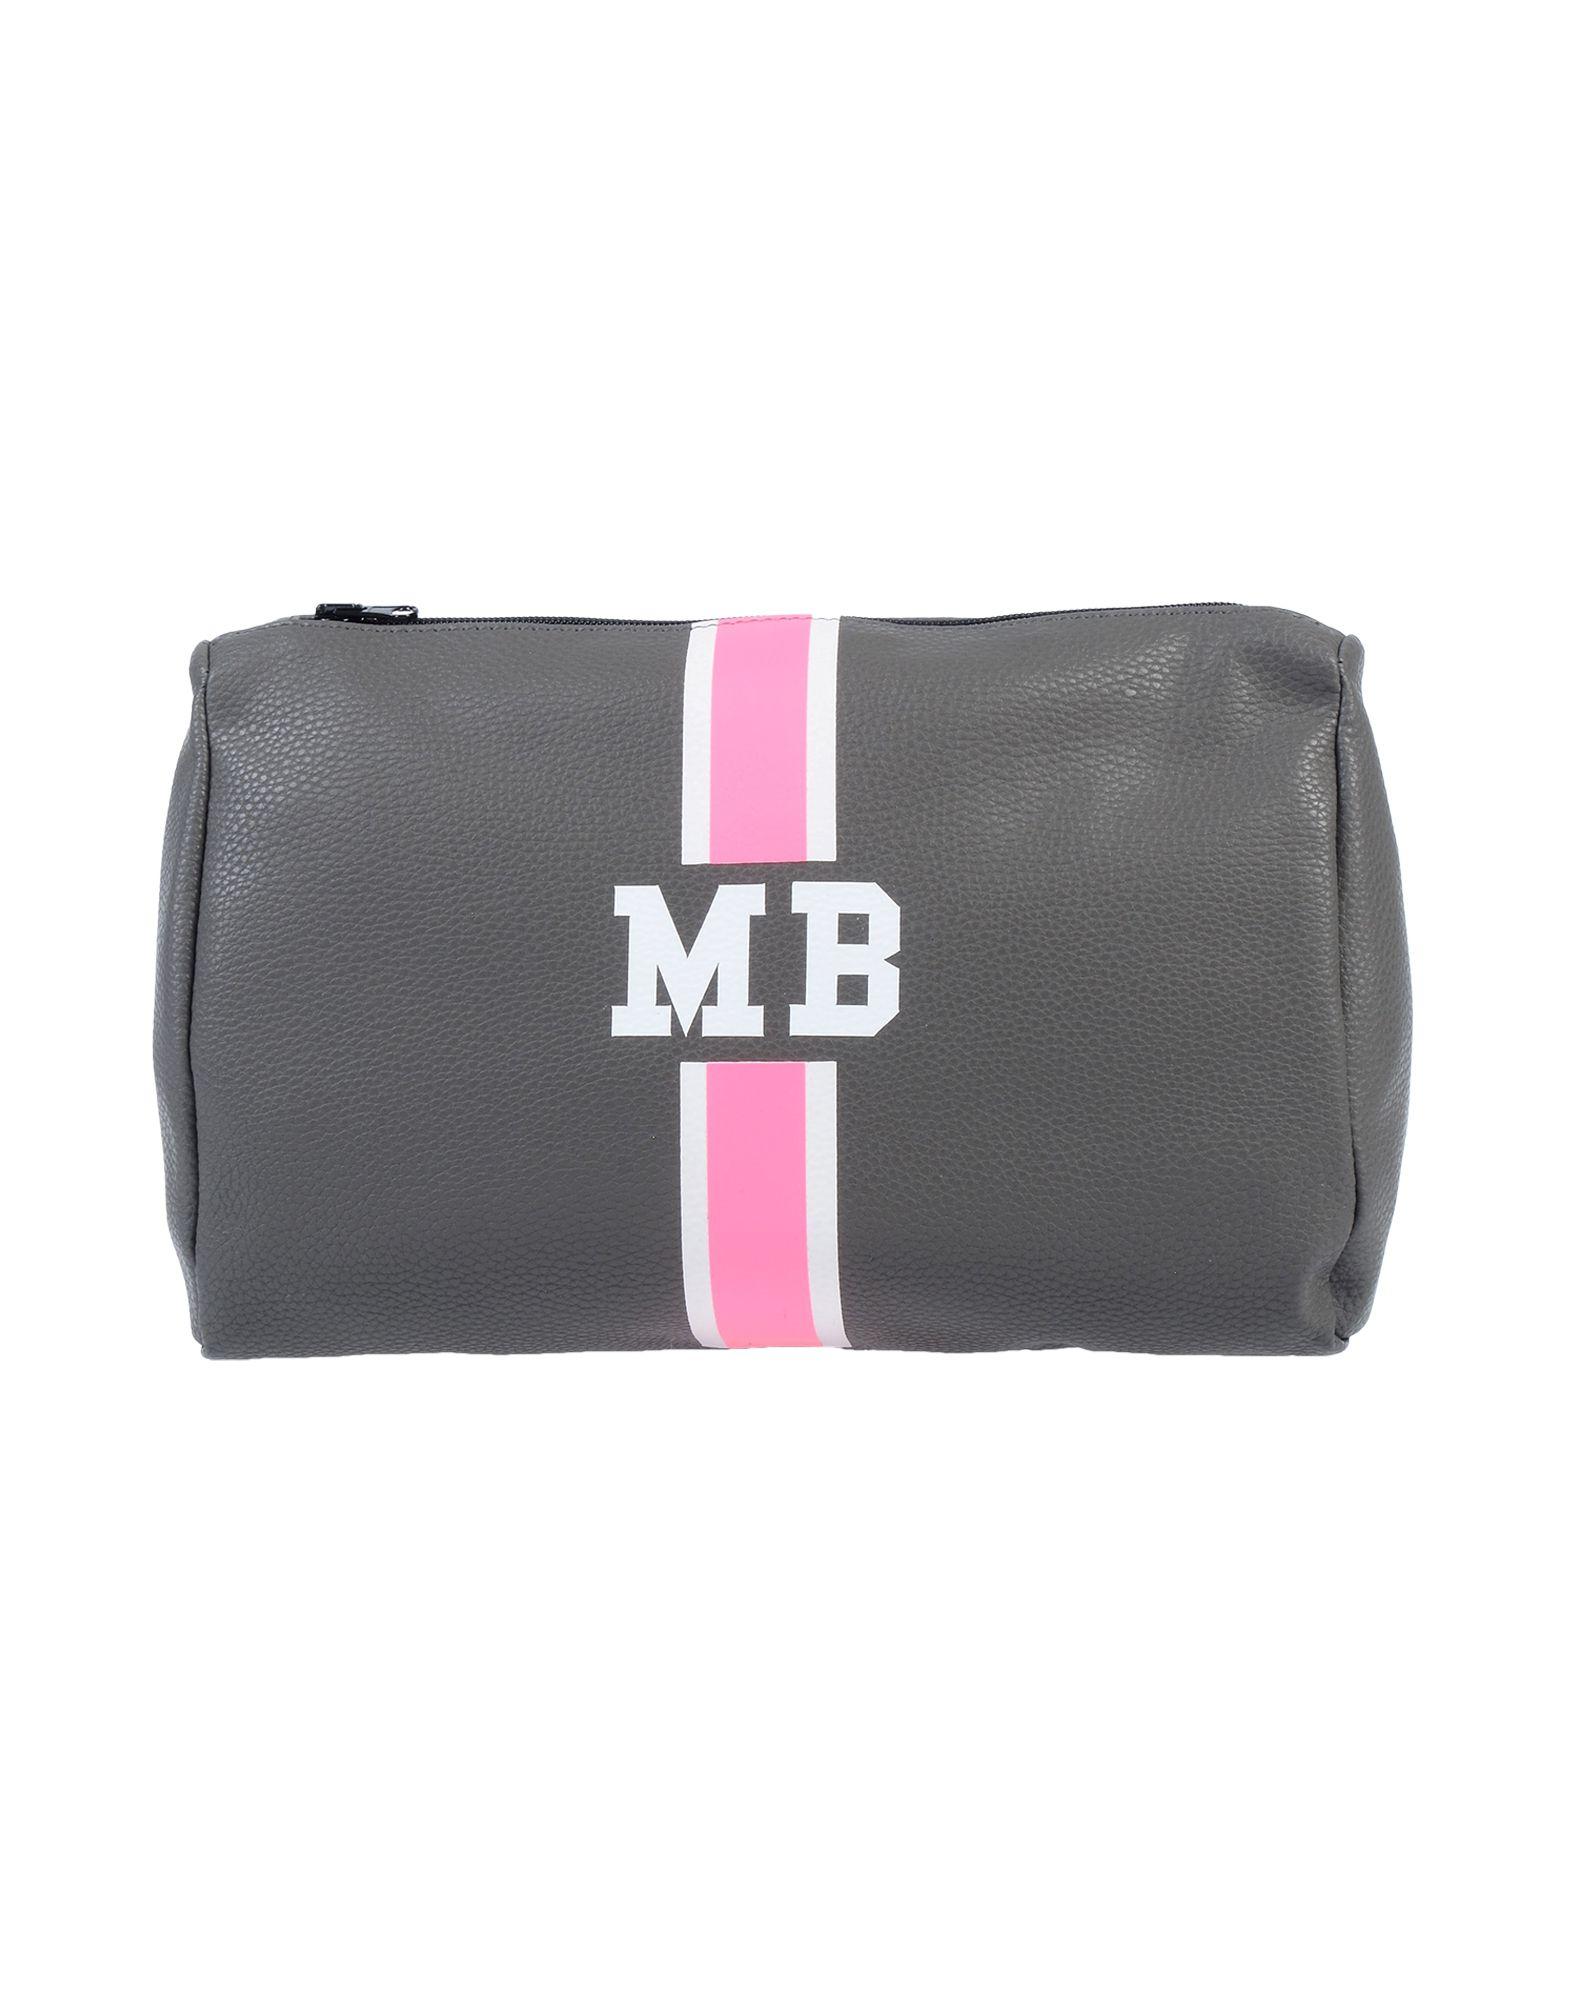 MIA BAG Beauty case bag mia louna bag